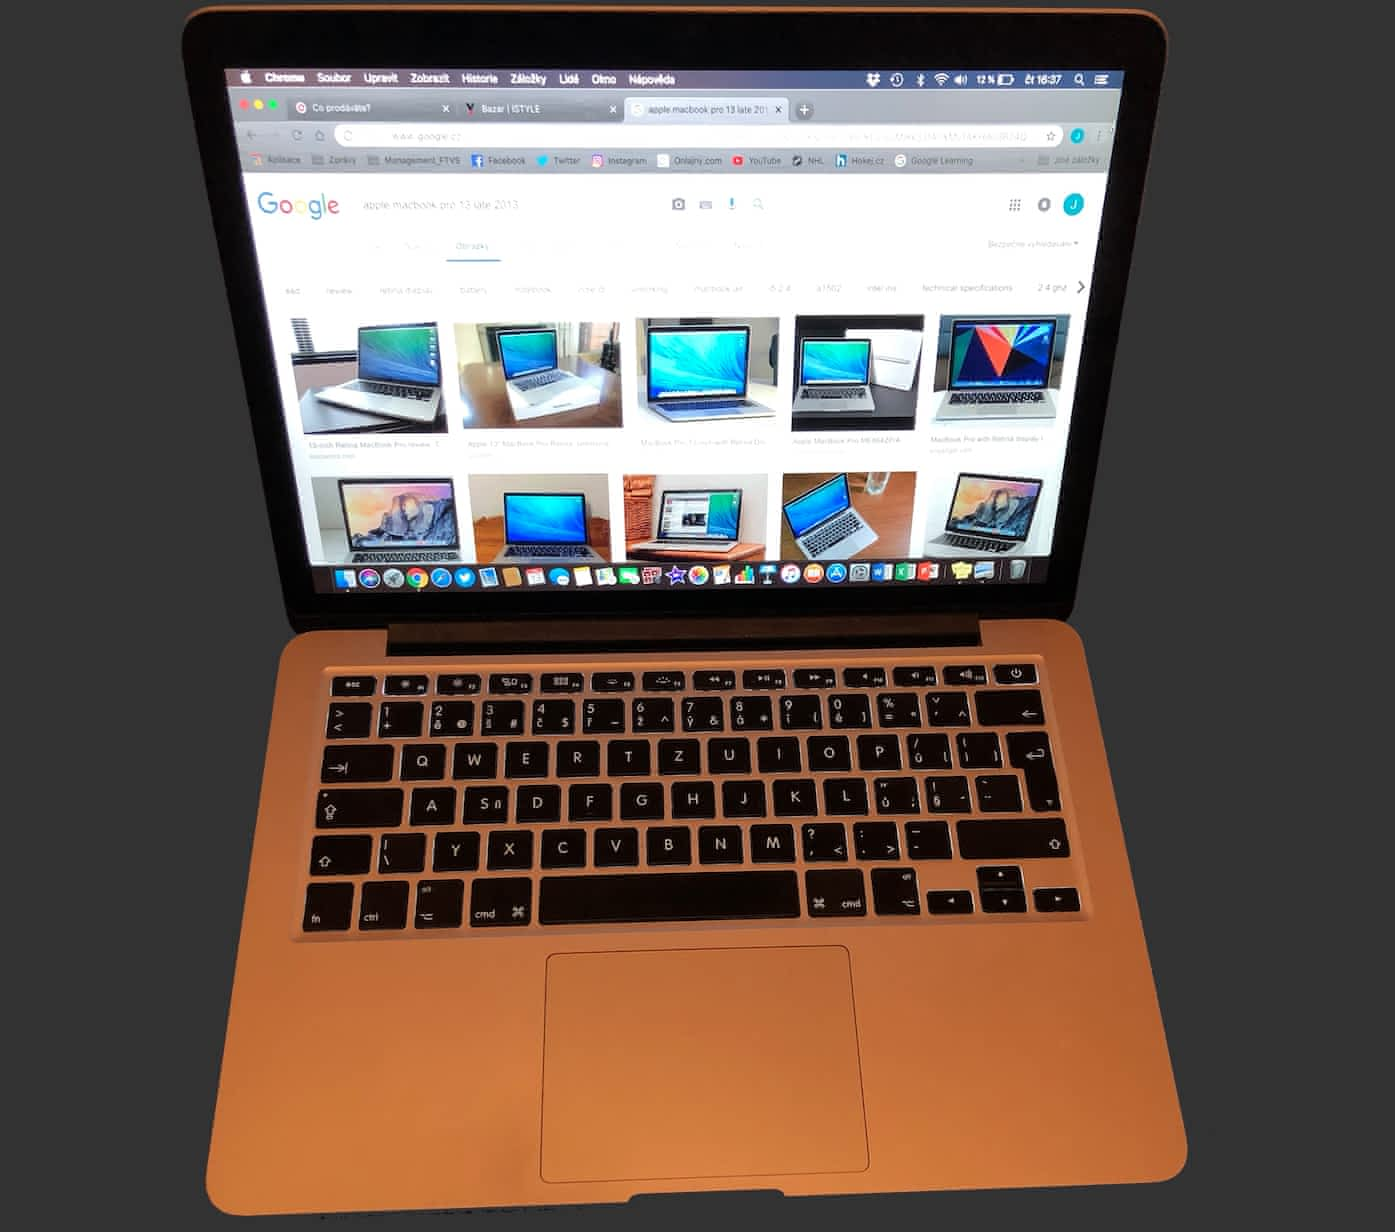 macbook_pro_late2013_retina